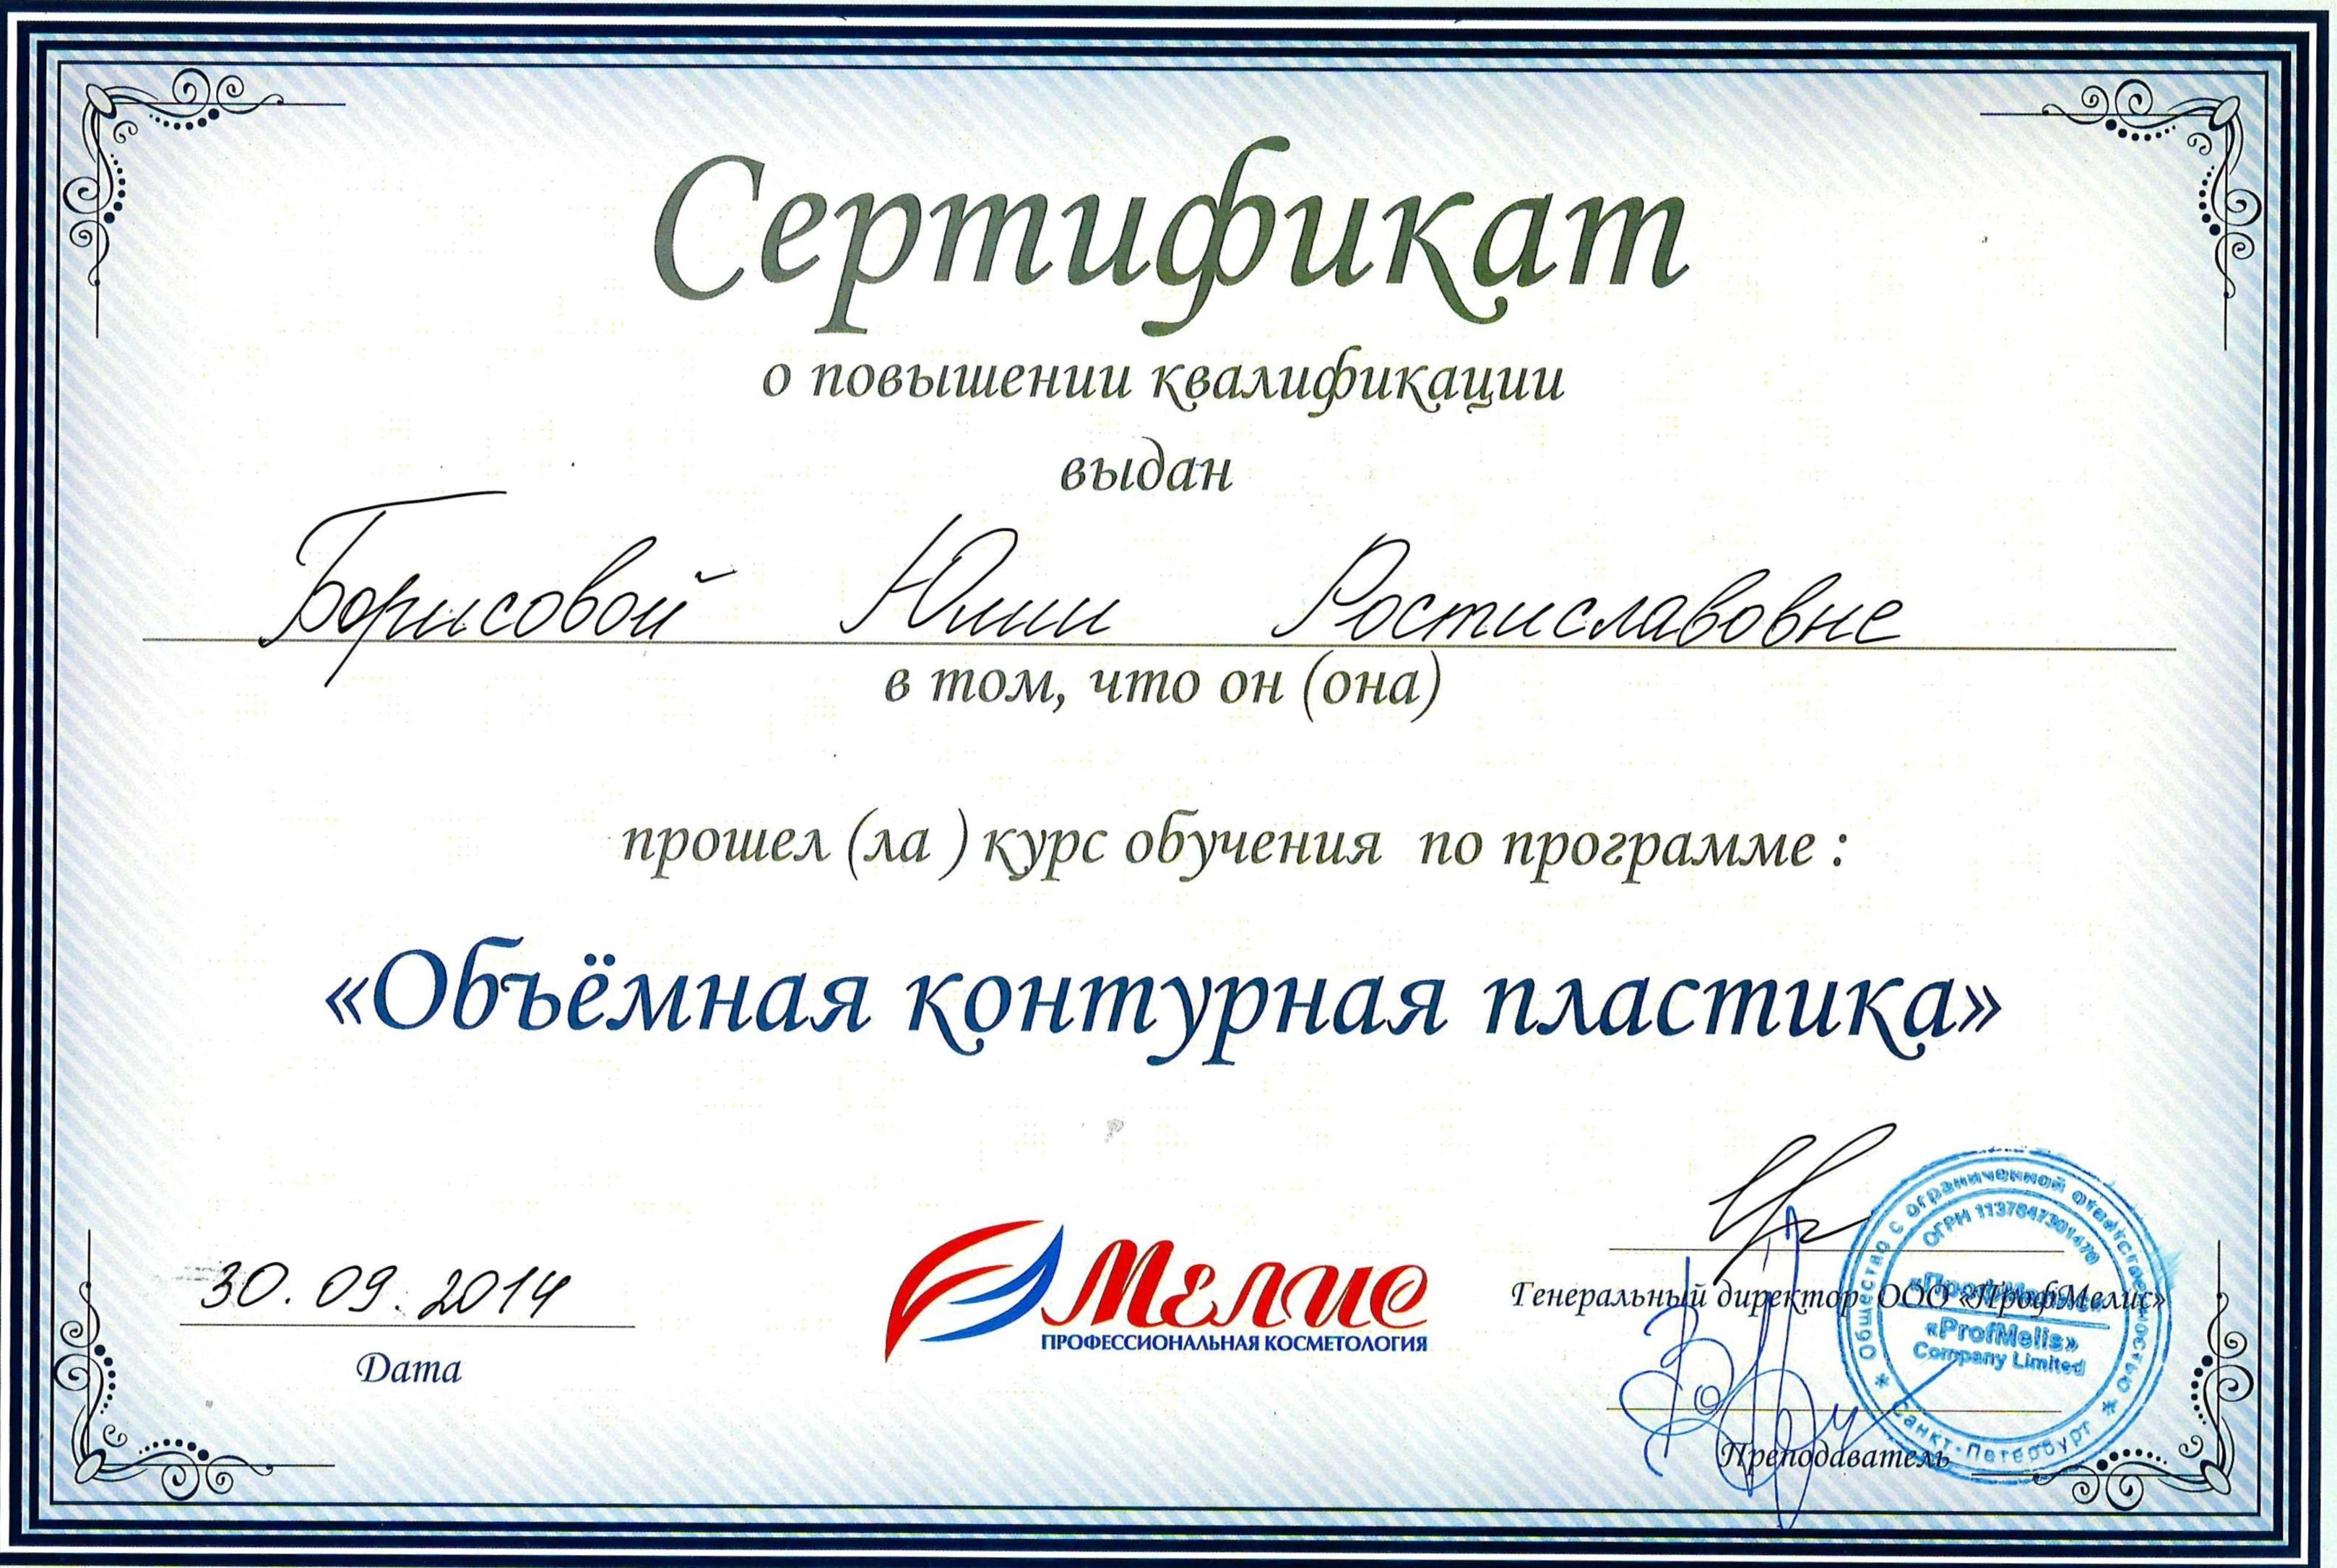 Сертификат — Объемная контурная пластика. Григорьева Юлия Ростиславовна